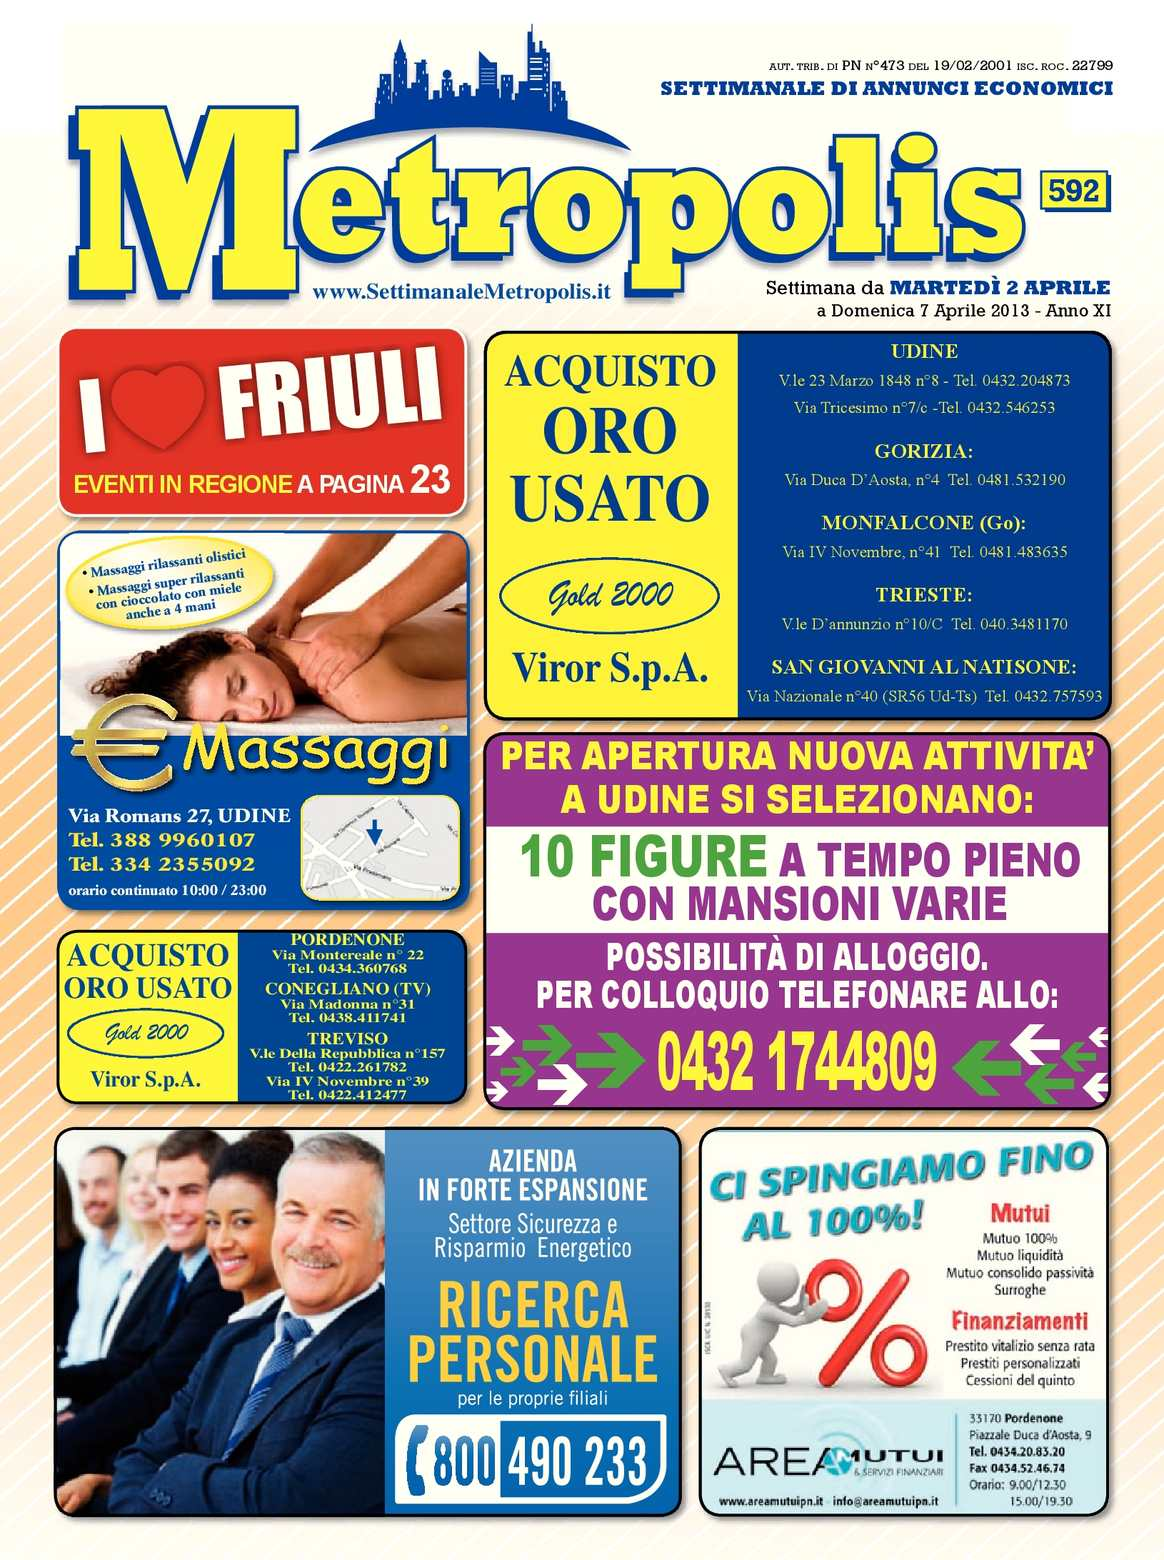 Calaméo - #592 Metropolis del 2 Aprile 2013